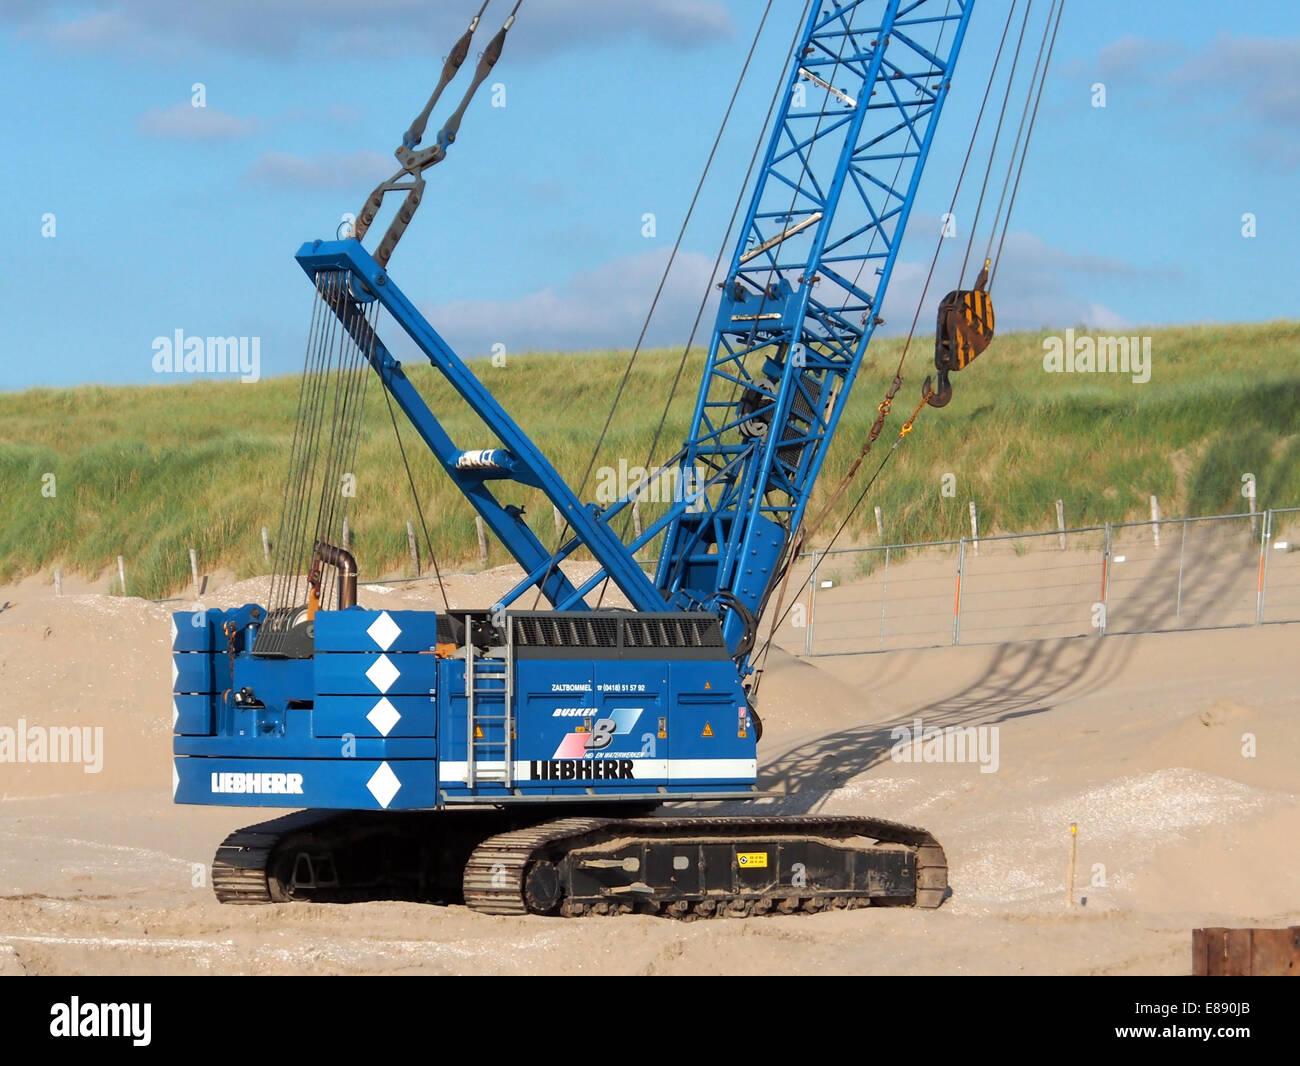 Liebherr crawler crane at Noordwijk beach, pic2 Stock Photo